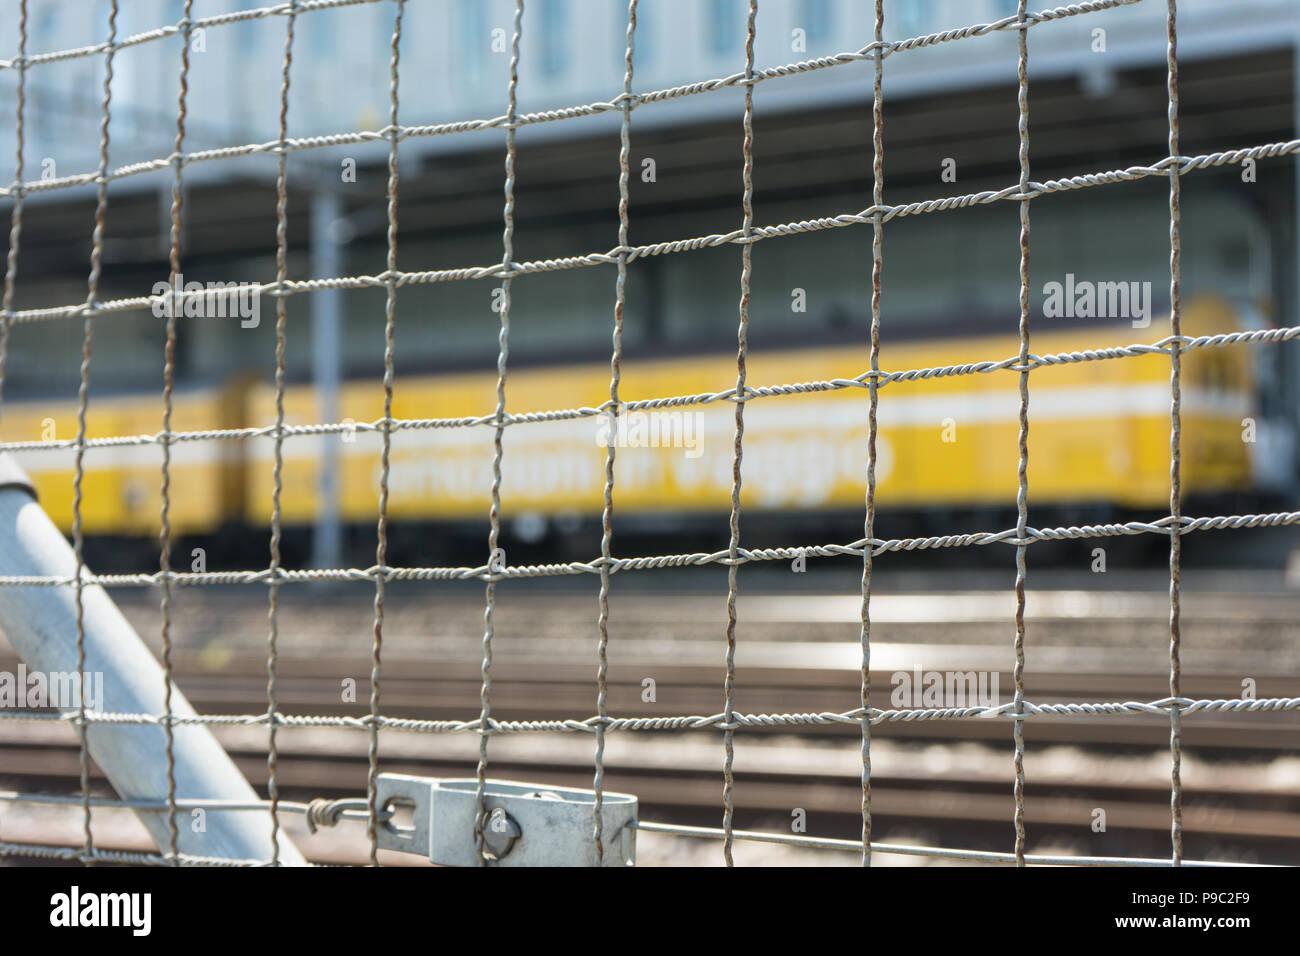 yellow train seen through grey iron fence with railtracks - Stock Image